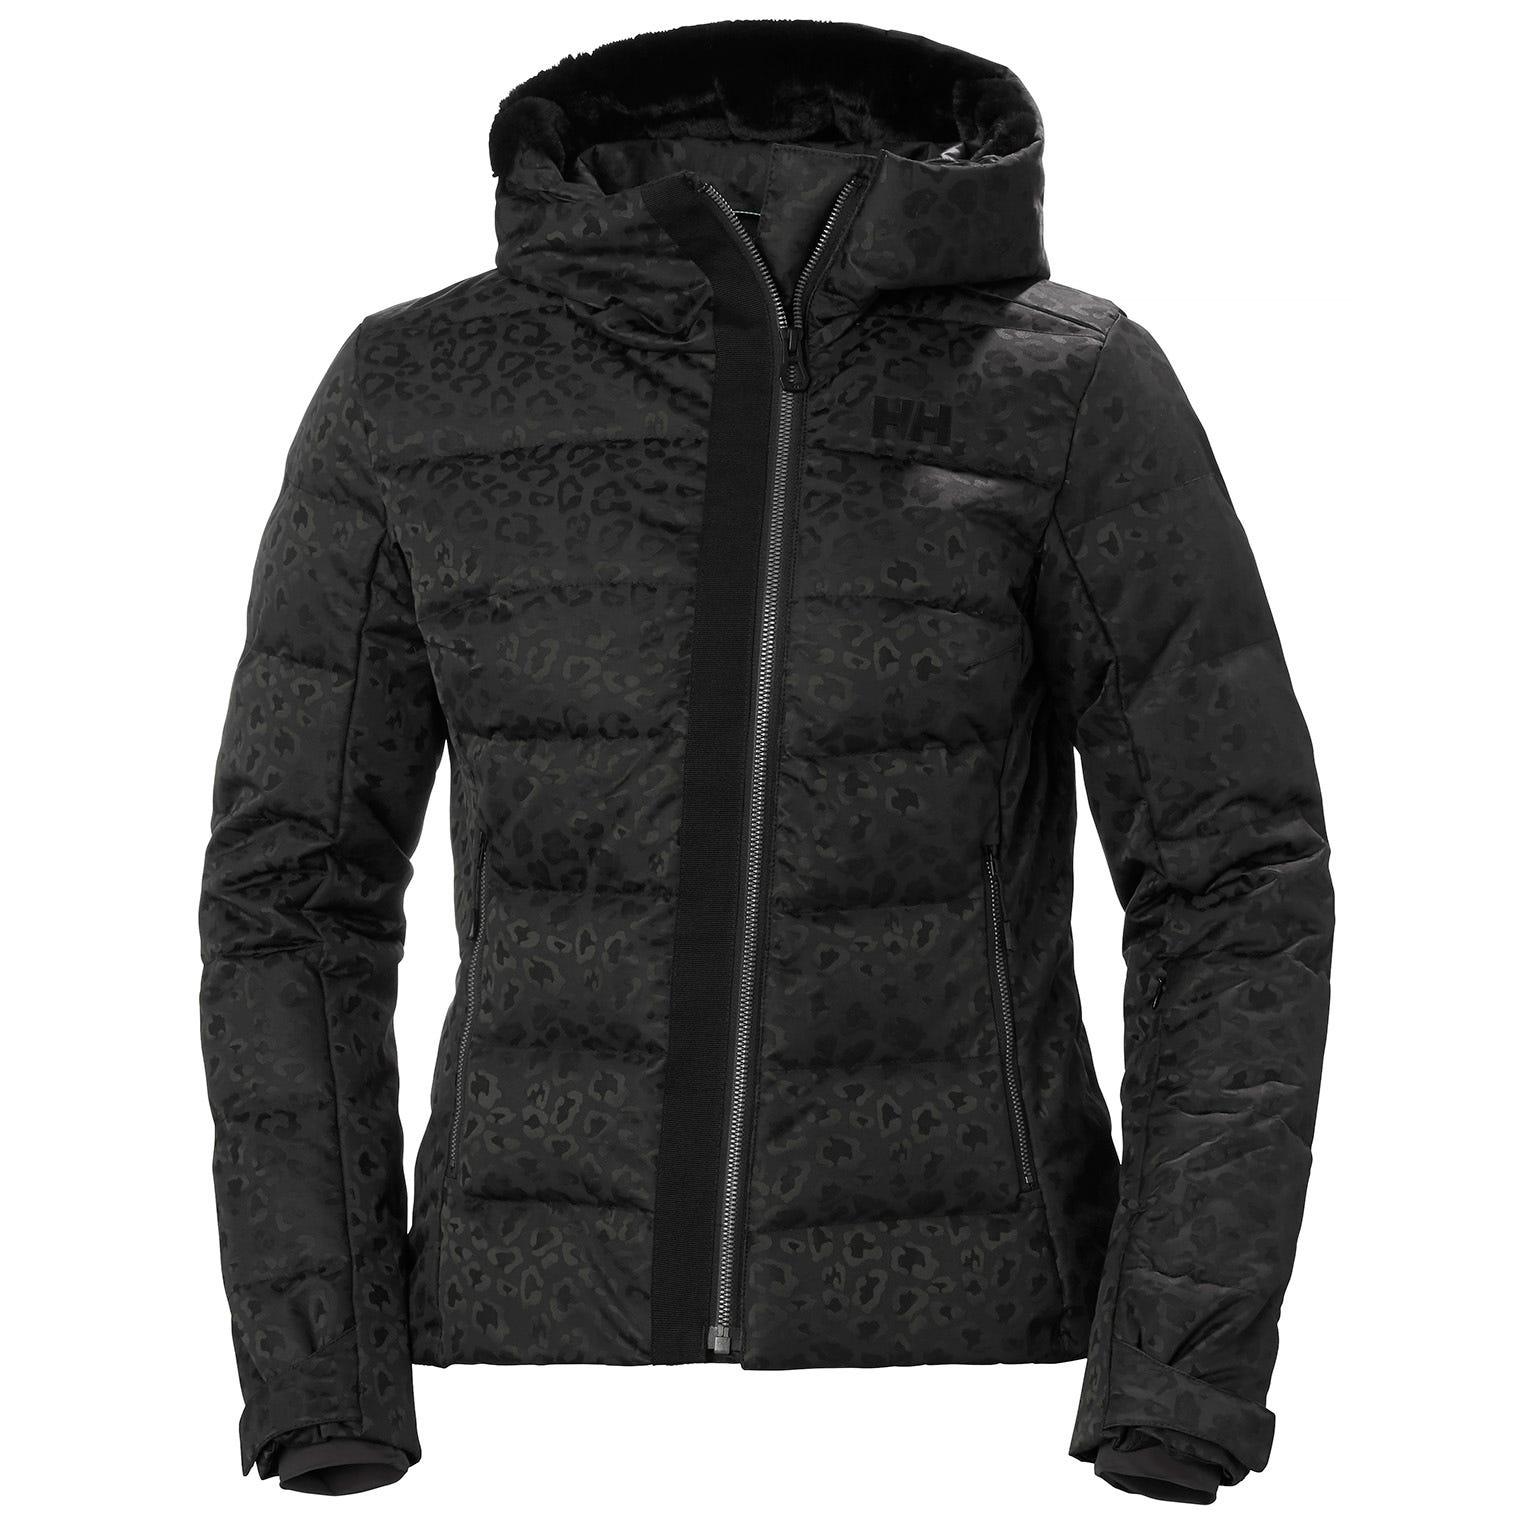 Helly Hansen Womens Valdisere Puffy Ski Jacket Black Xs